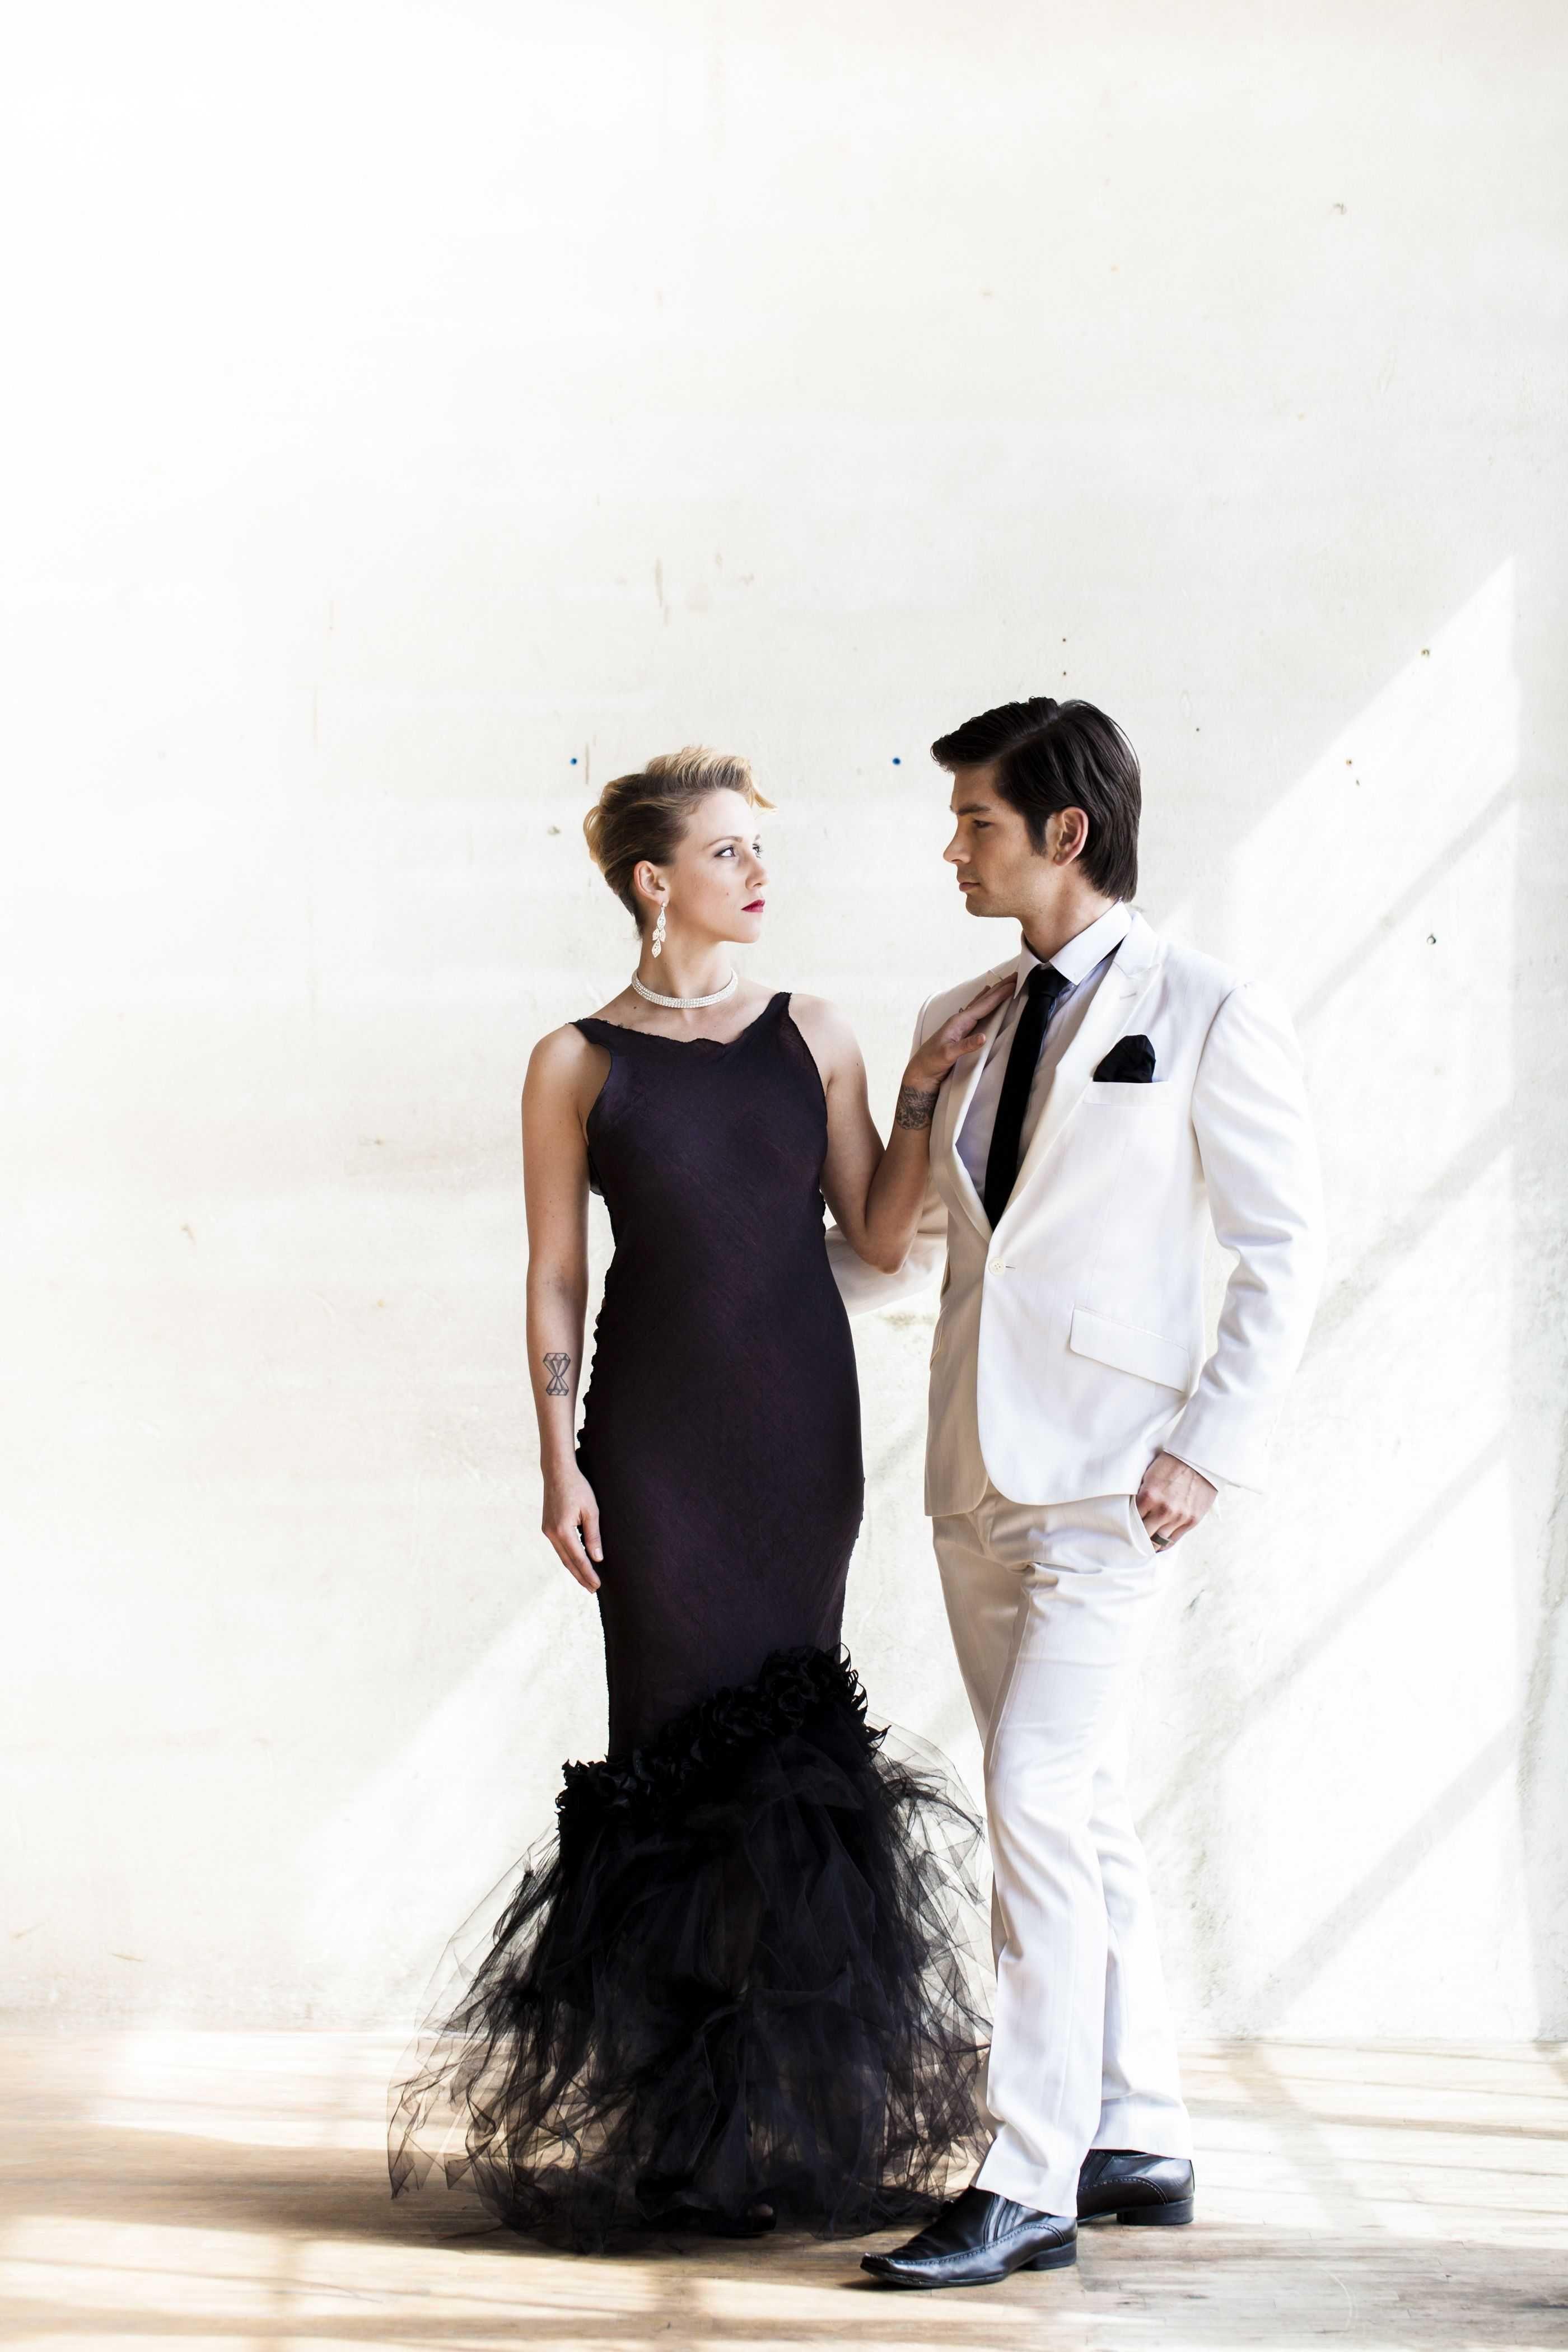 Elegant wedding dresses pictures for man wedding ideas for world